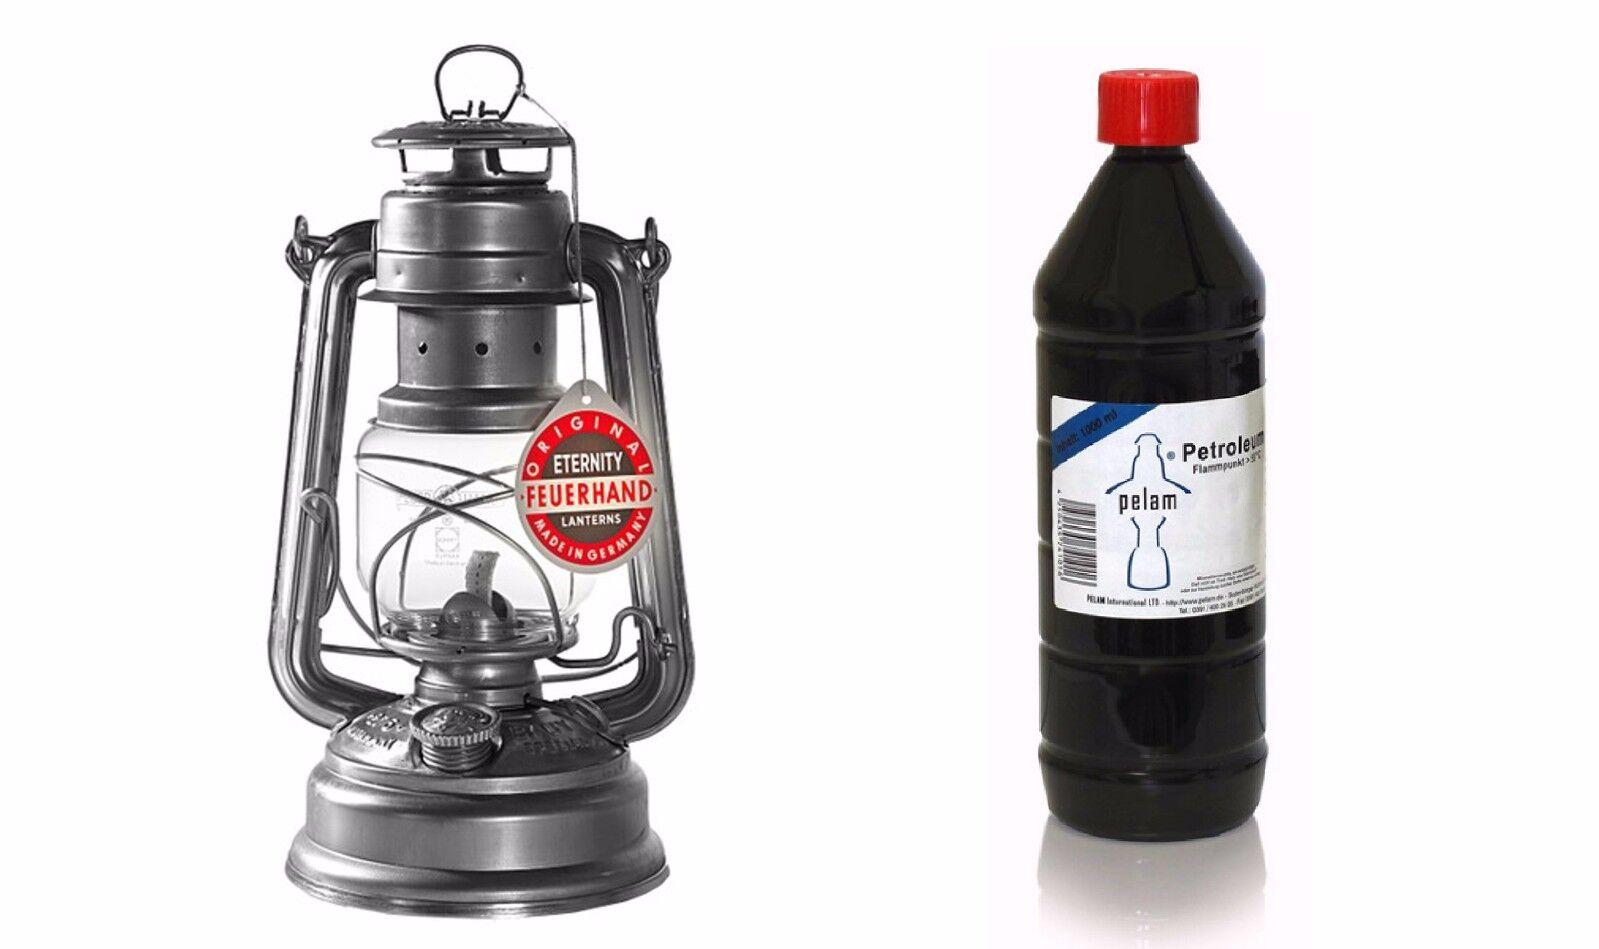 Petroleum FEUERHAND Petromax 4x1L Lampenöl Pelam Starklichtlampen Kocher 4,5//L